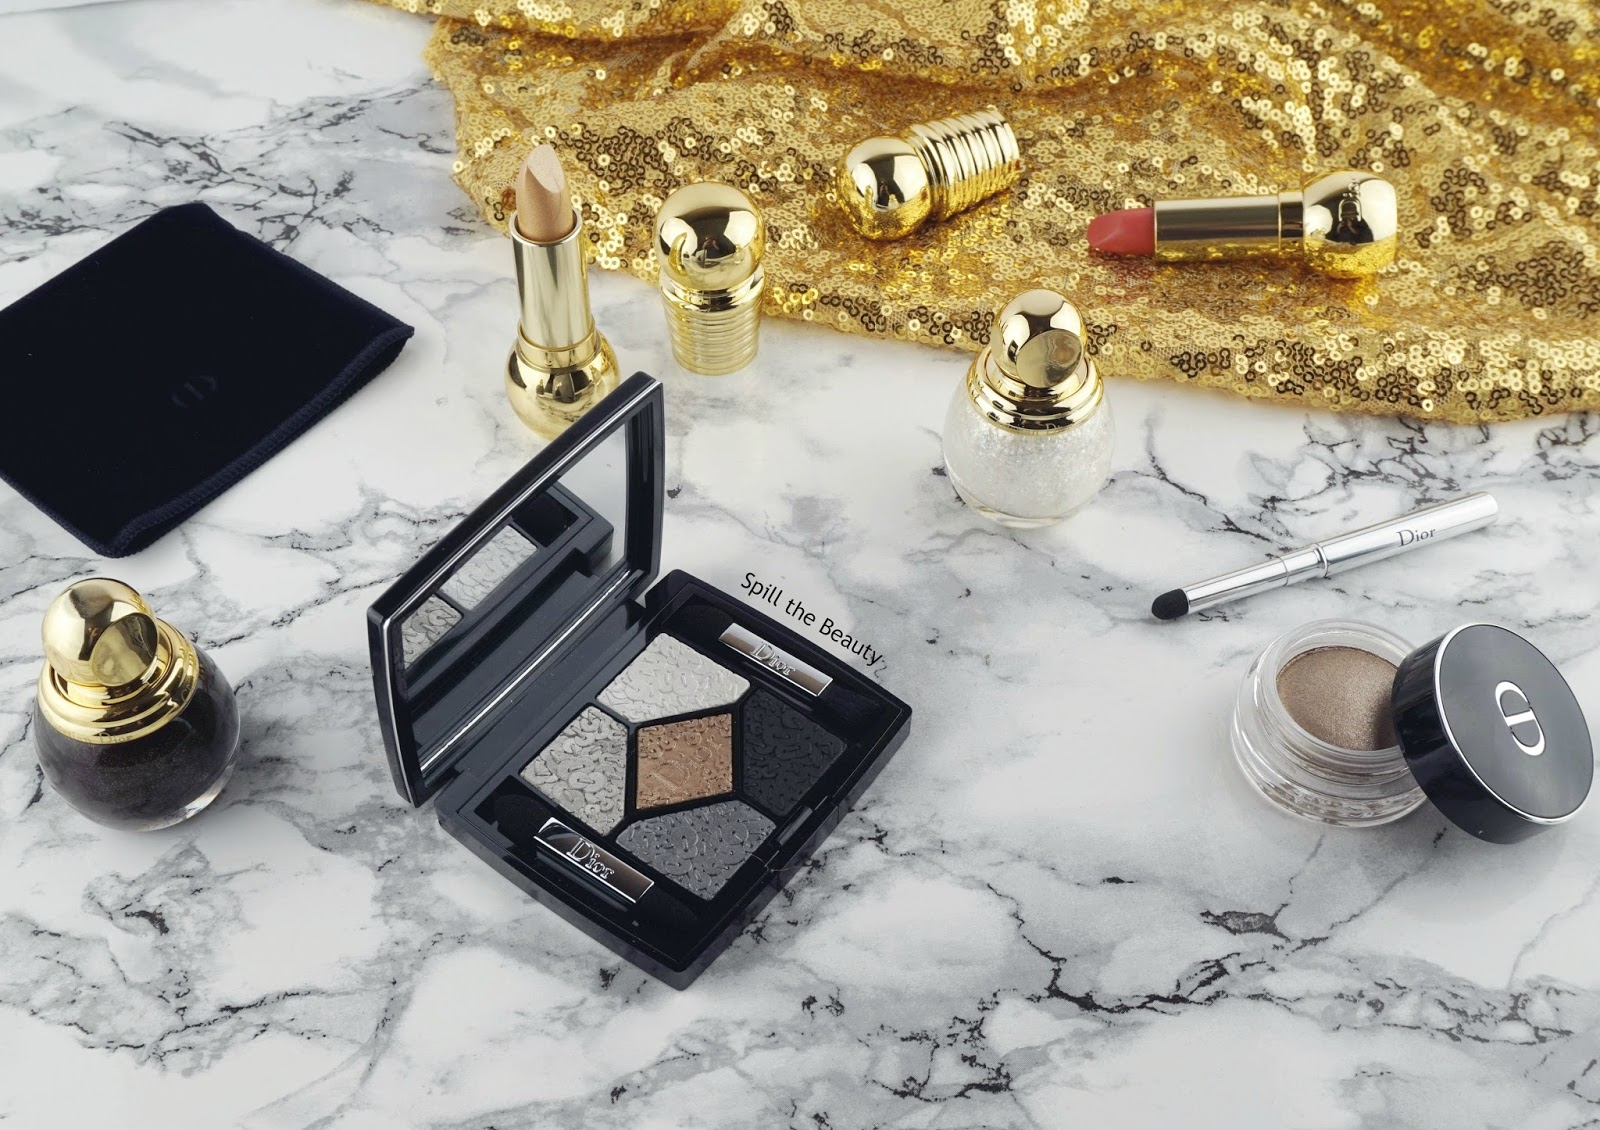 dior holiday makeup 2016 1 review swatches splendor